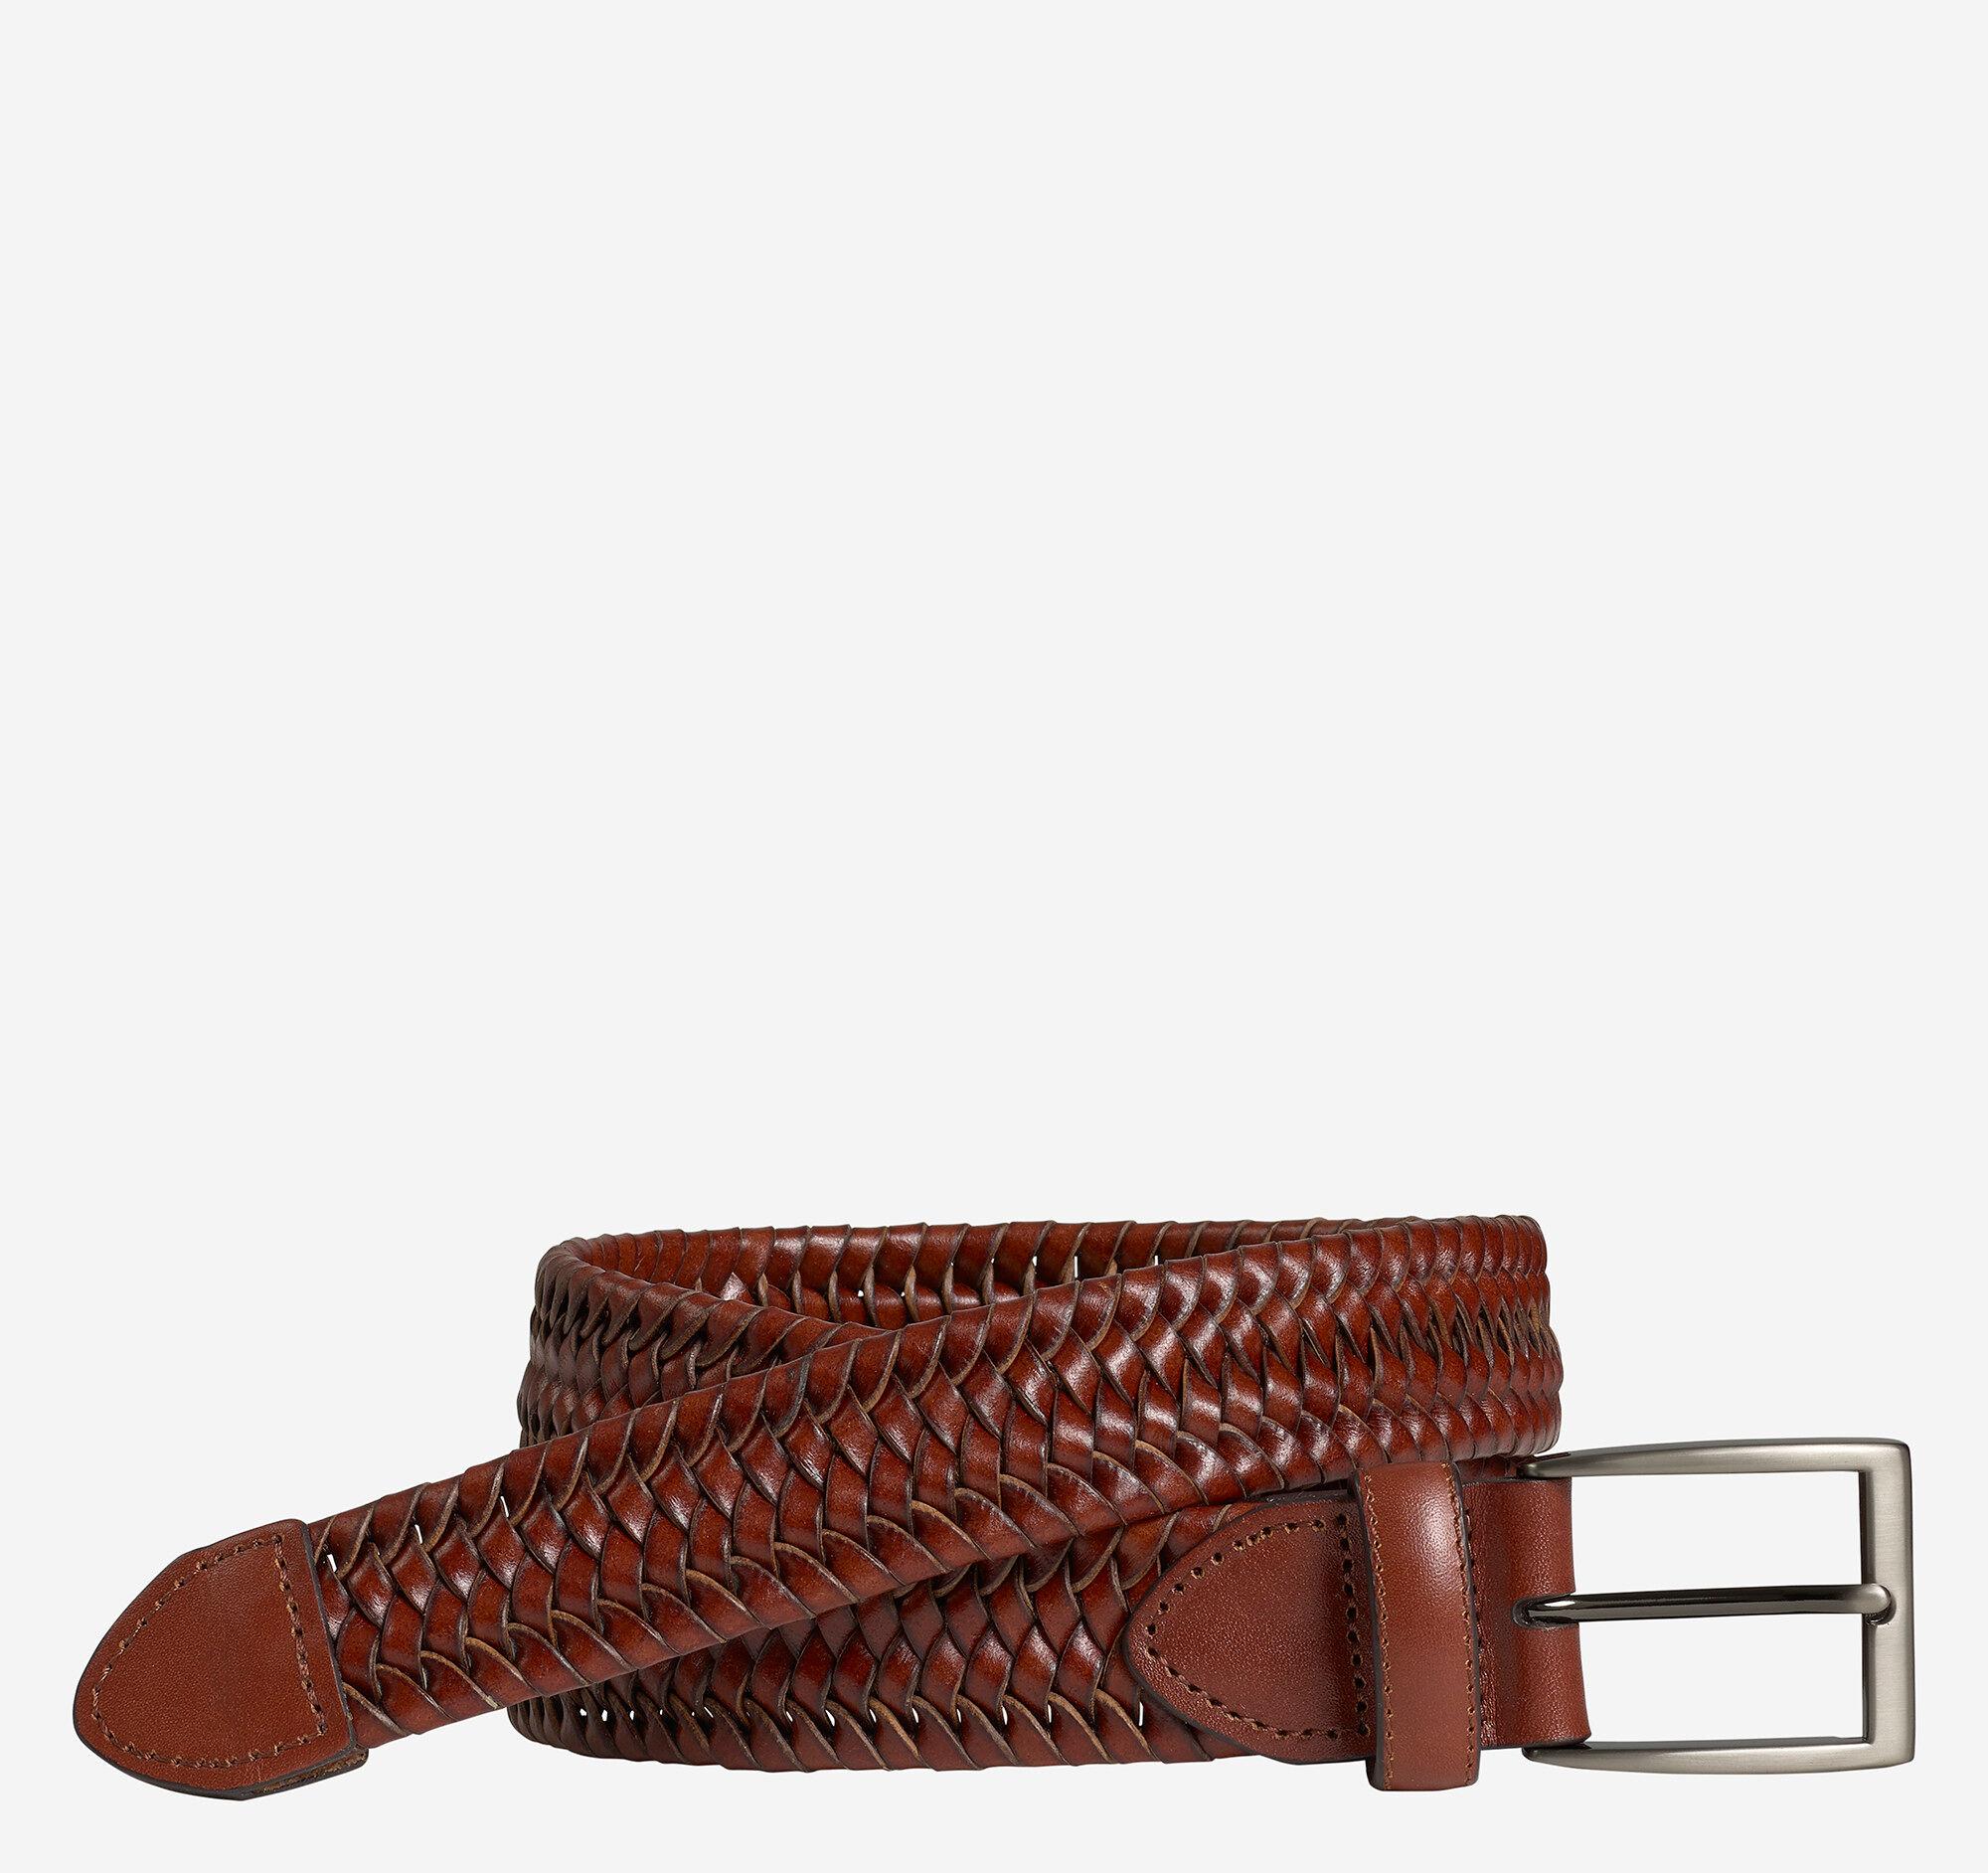 Johnston & Murphy Men's Stretch Leather Braided Belt - Cognac - Size 40